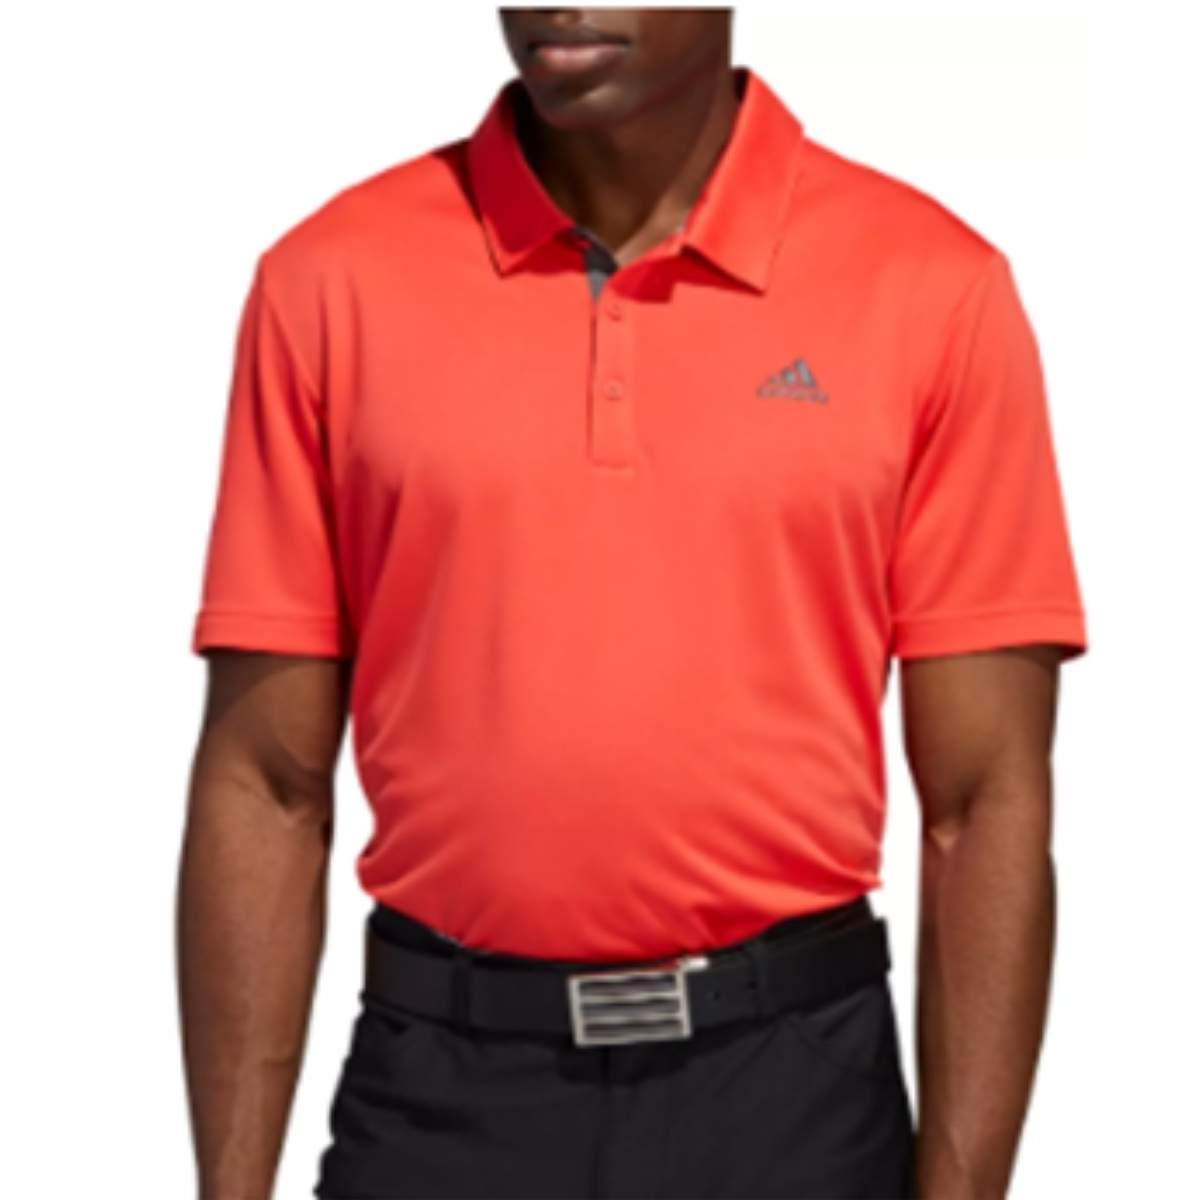 Adidas Men's Drive Novelty Golf Polo